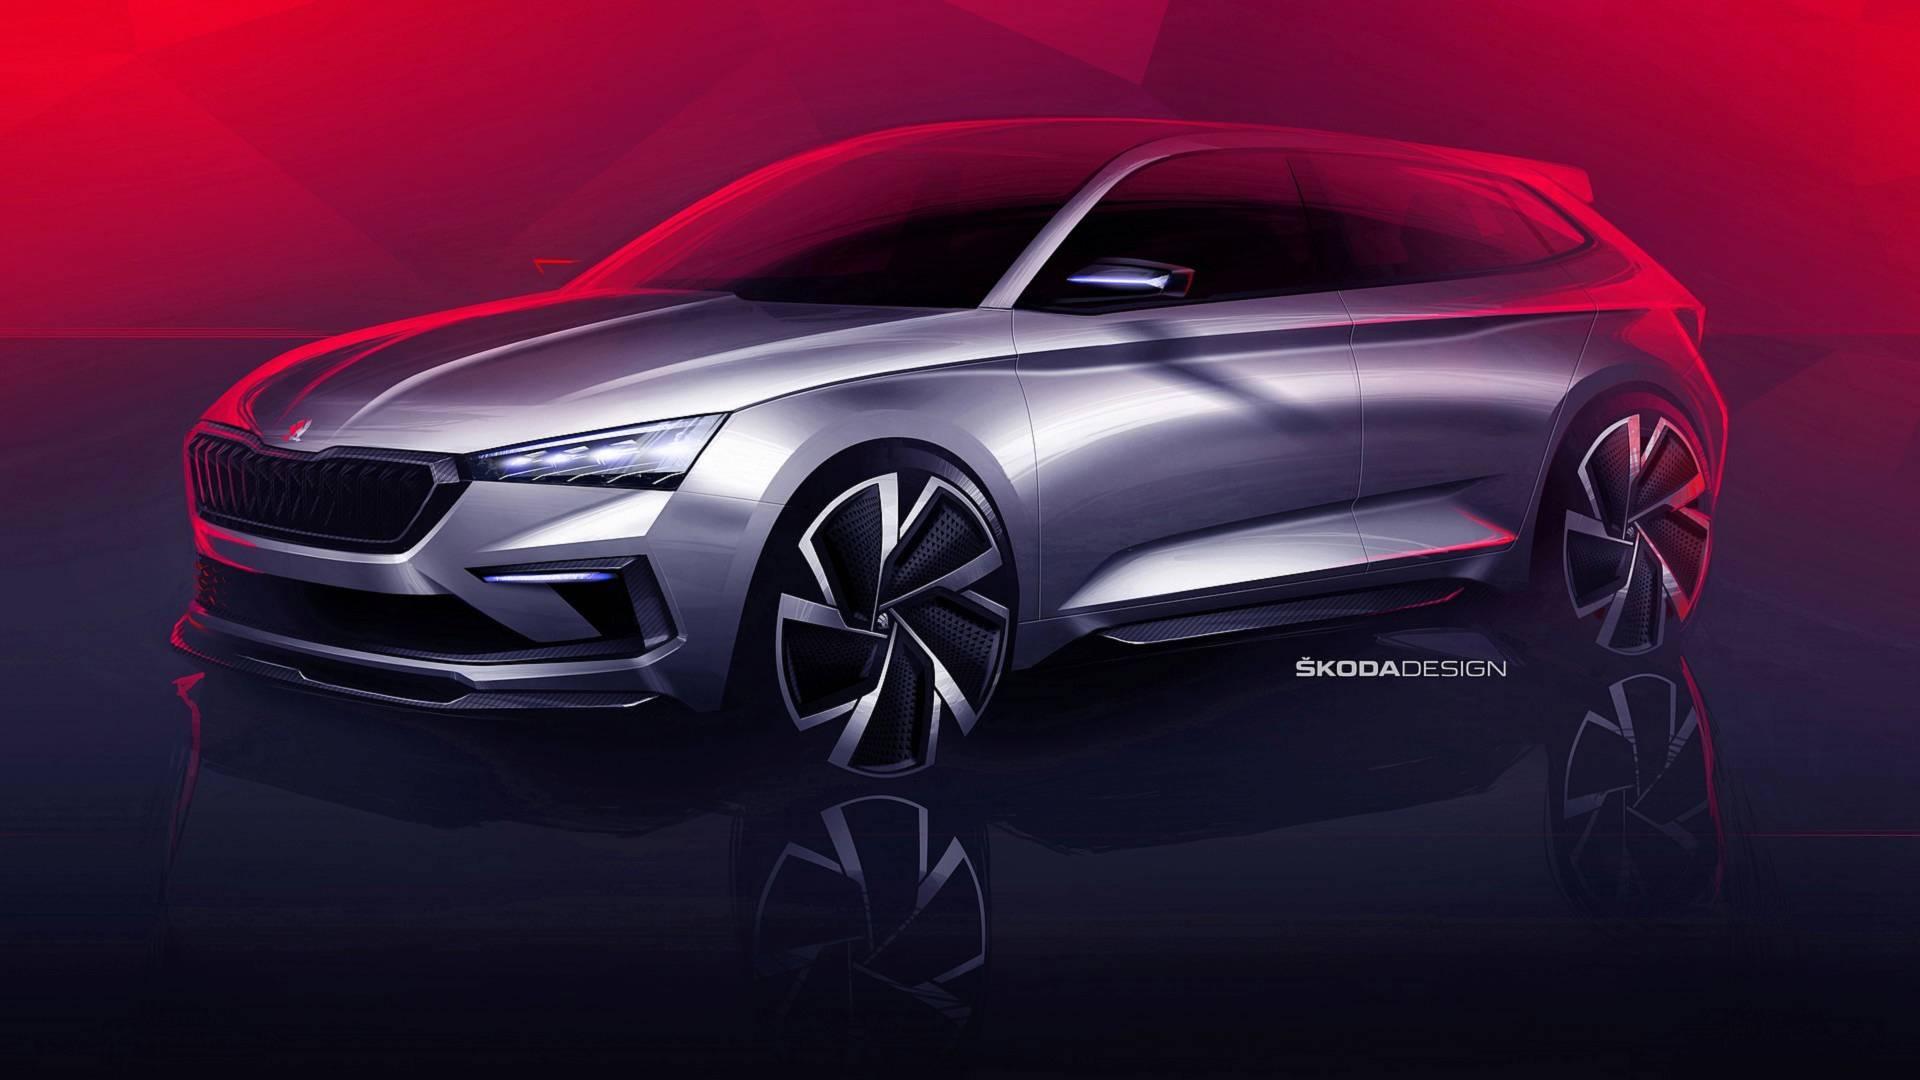 Škoda опубликовала эскизы концепт-кара Vision RS